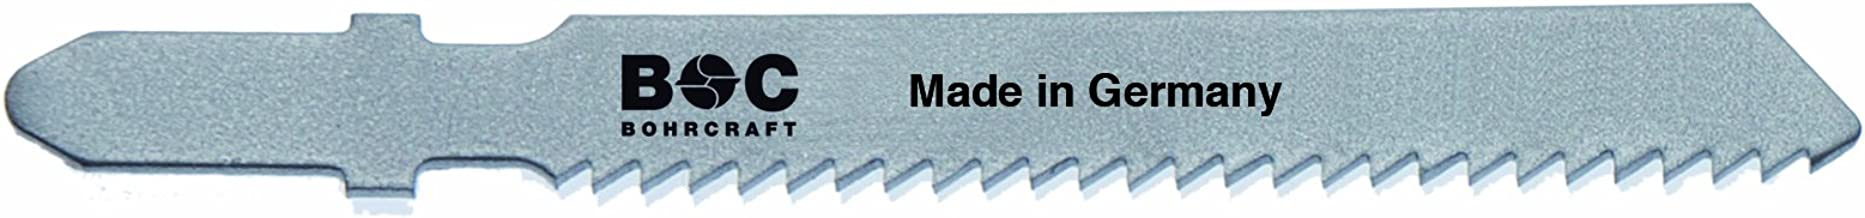 Bohrcraft–Sierra de calar (HSS, dientes Ondulado, ZT 2x 55mm Longitud en 5unidades de tarjeta, 1pieza, 19641600002